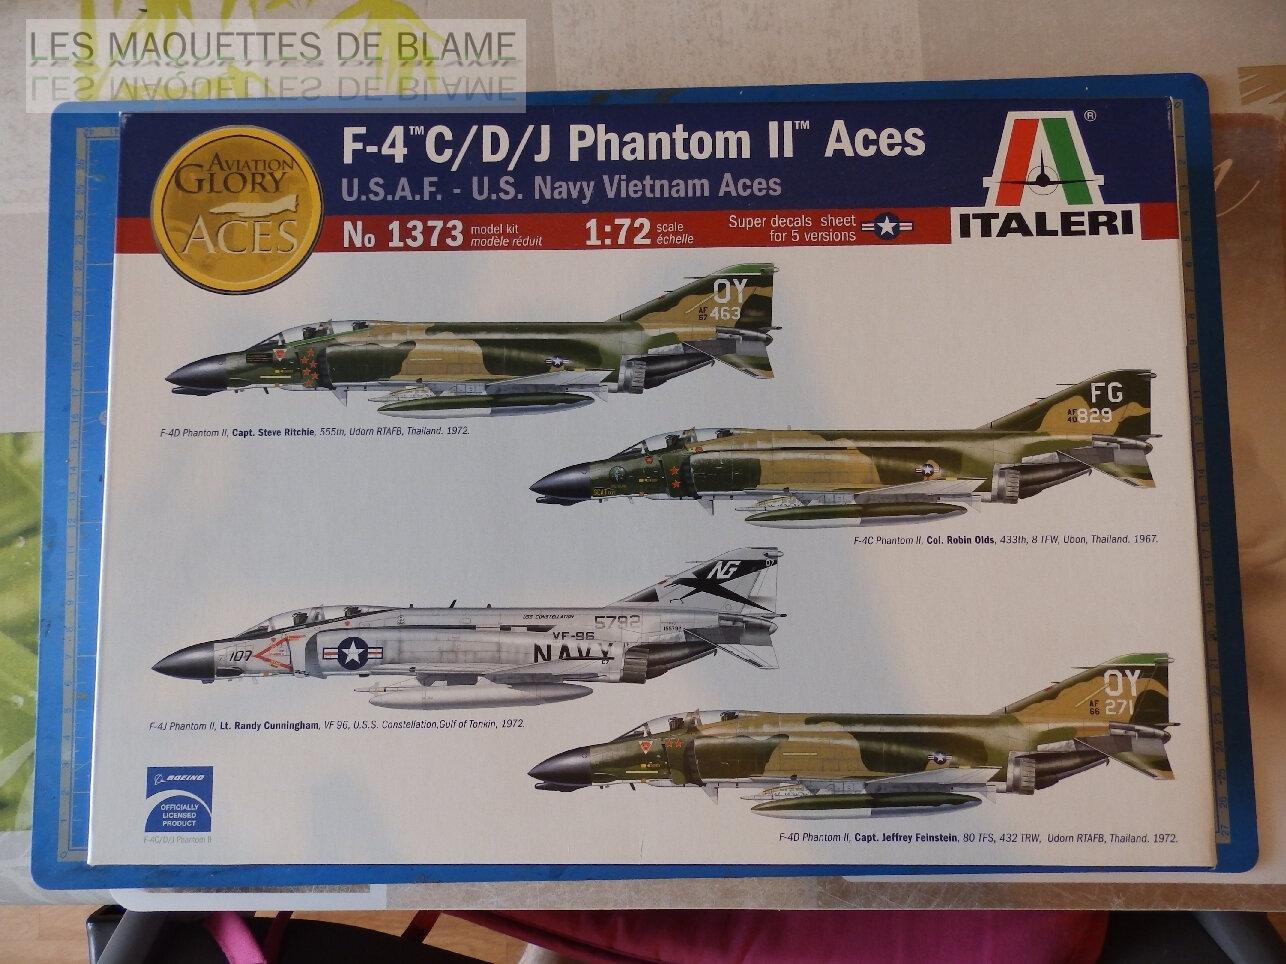 F-4C PHANTOM II COL. ROBIN OLDS 433TH, 8 TFWB UBON THAILAND 1967!